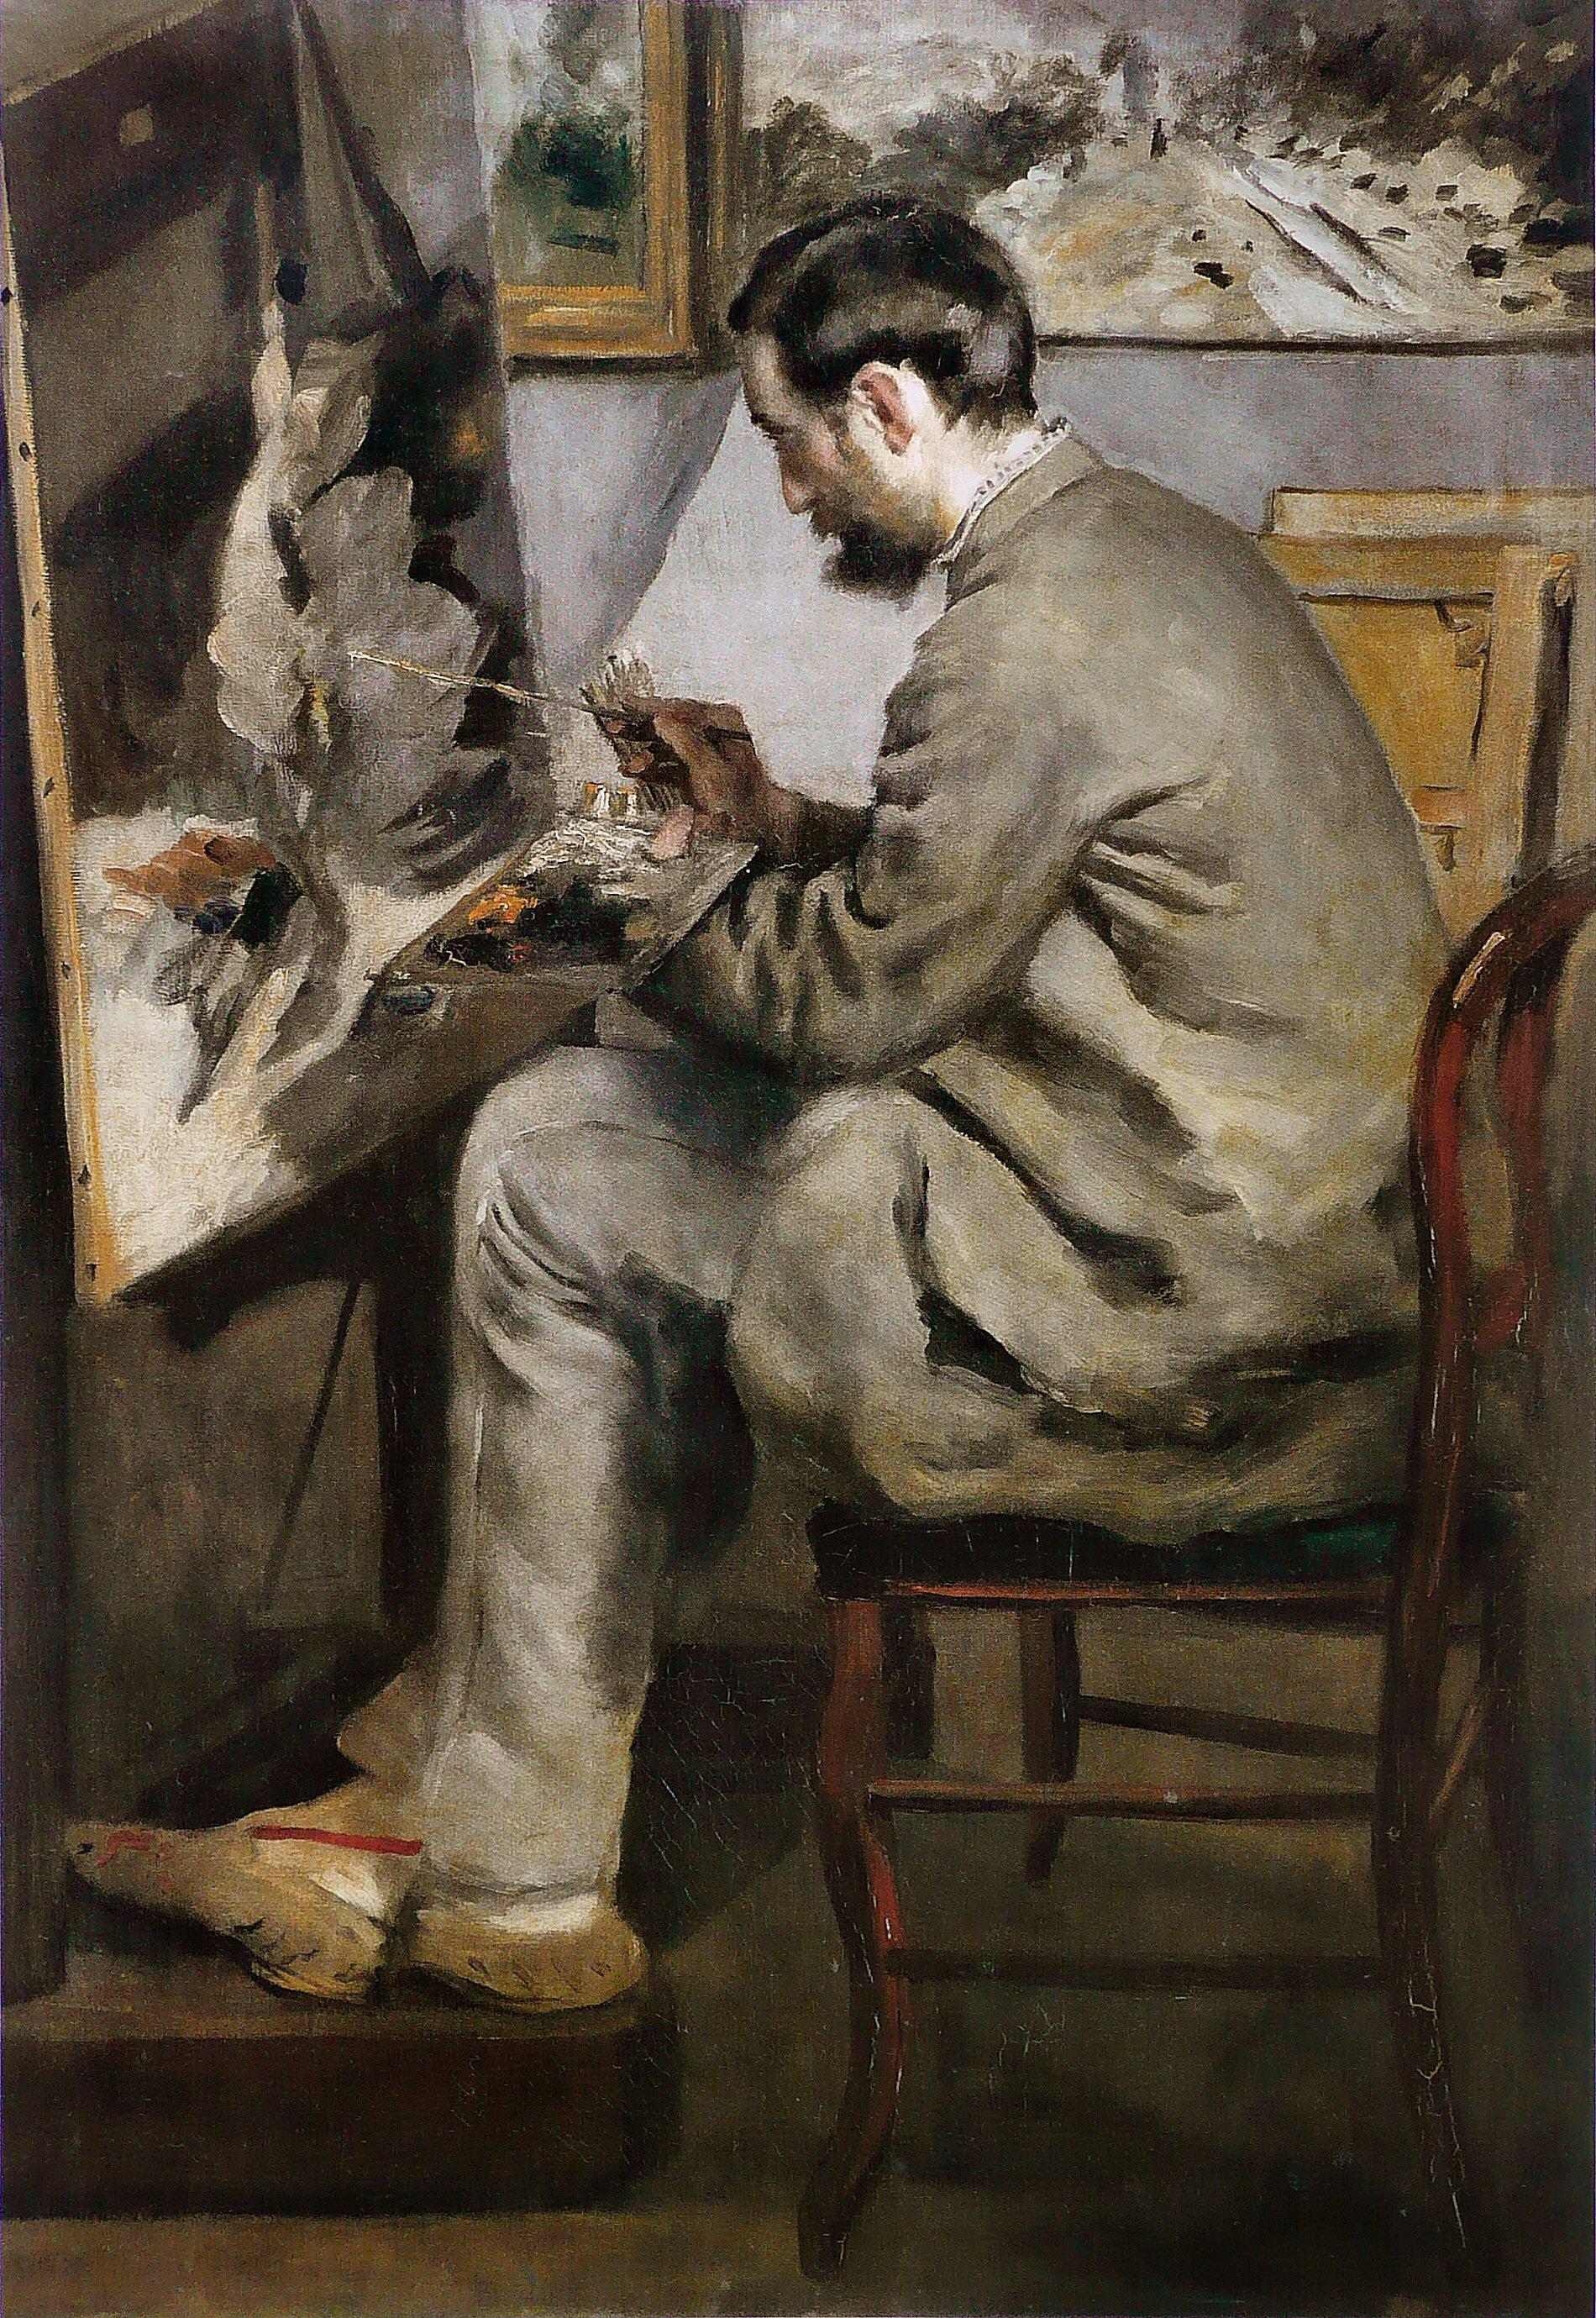 Renoir-Pierre-Auguste-Bazille-peignant-a-son-chevalet-1867-105x73,5cm-Montpellier-musee-Fabre